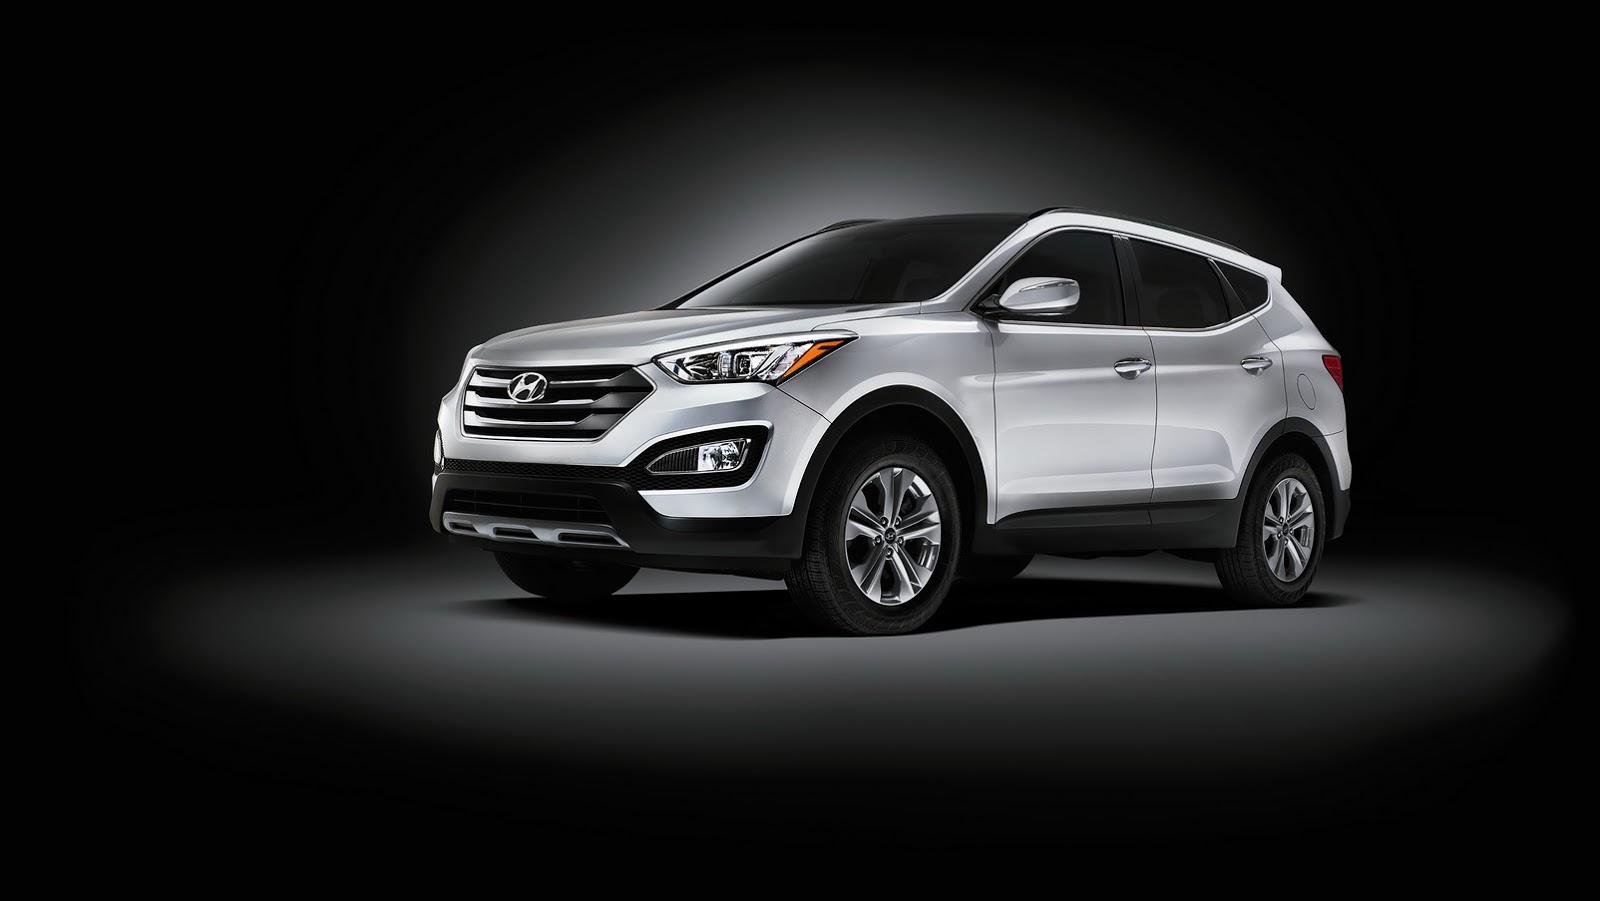 2019 Santa Fe Sport >> Hyundai Refreshes 2015 Santa Fe with Chassis and Equipment Upgrades